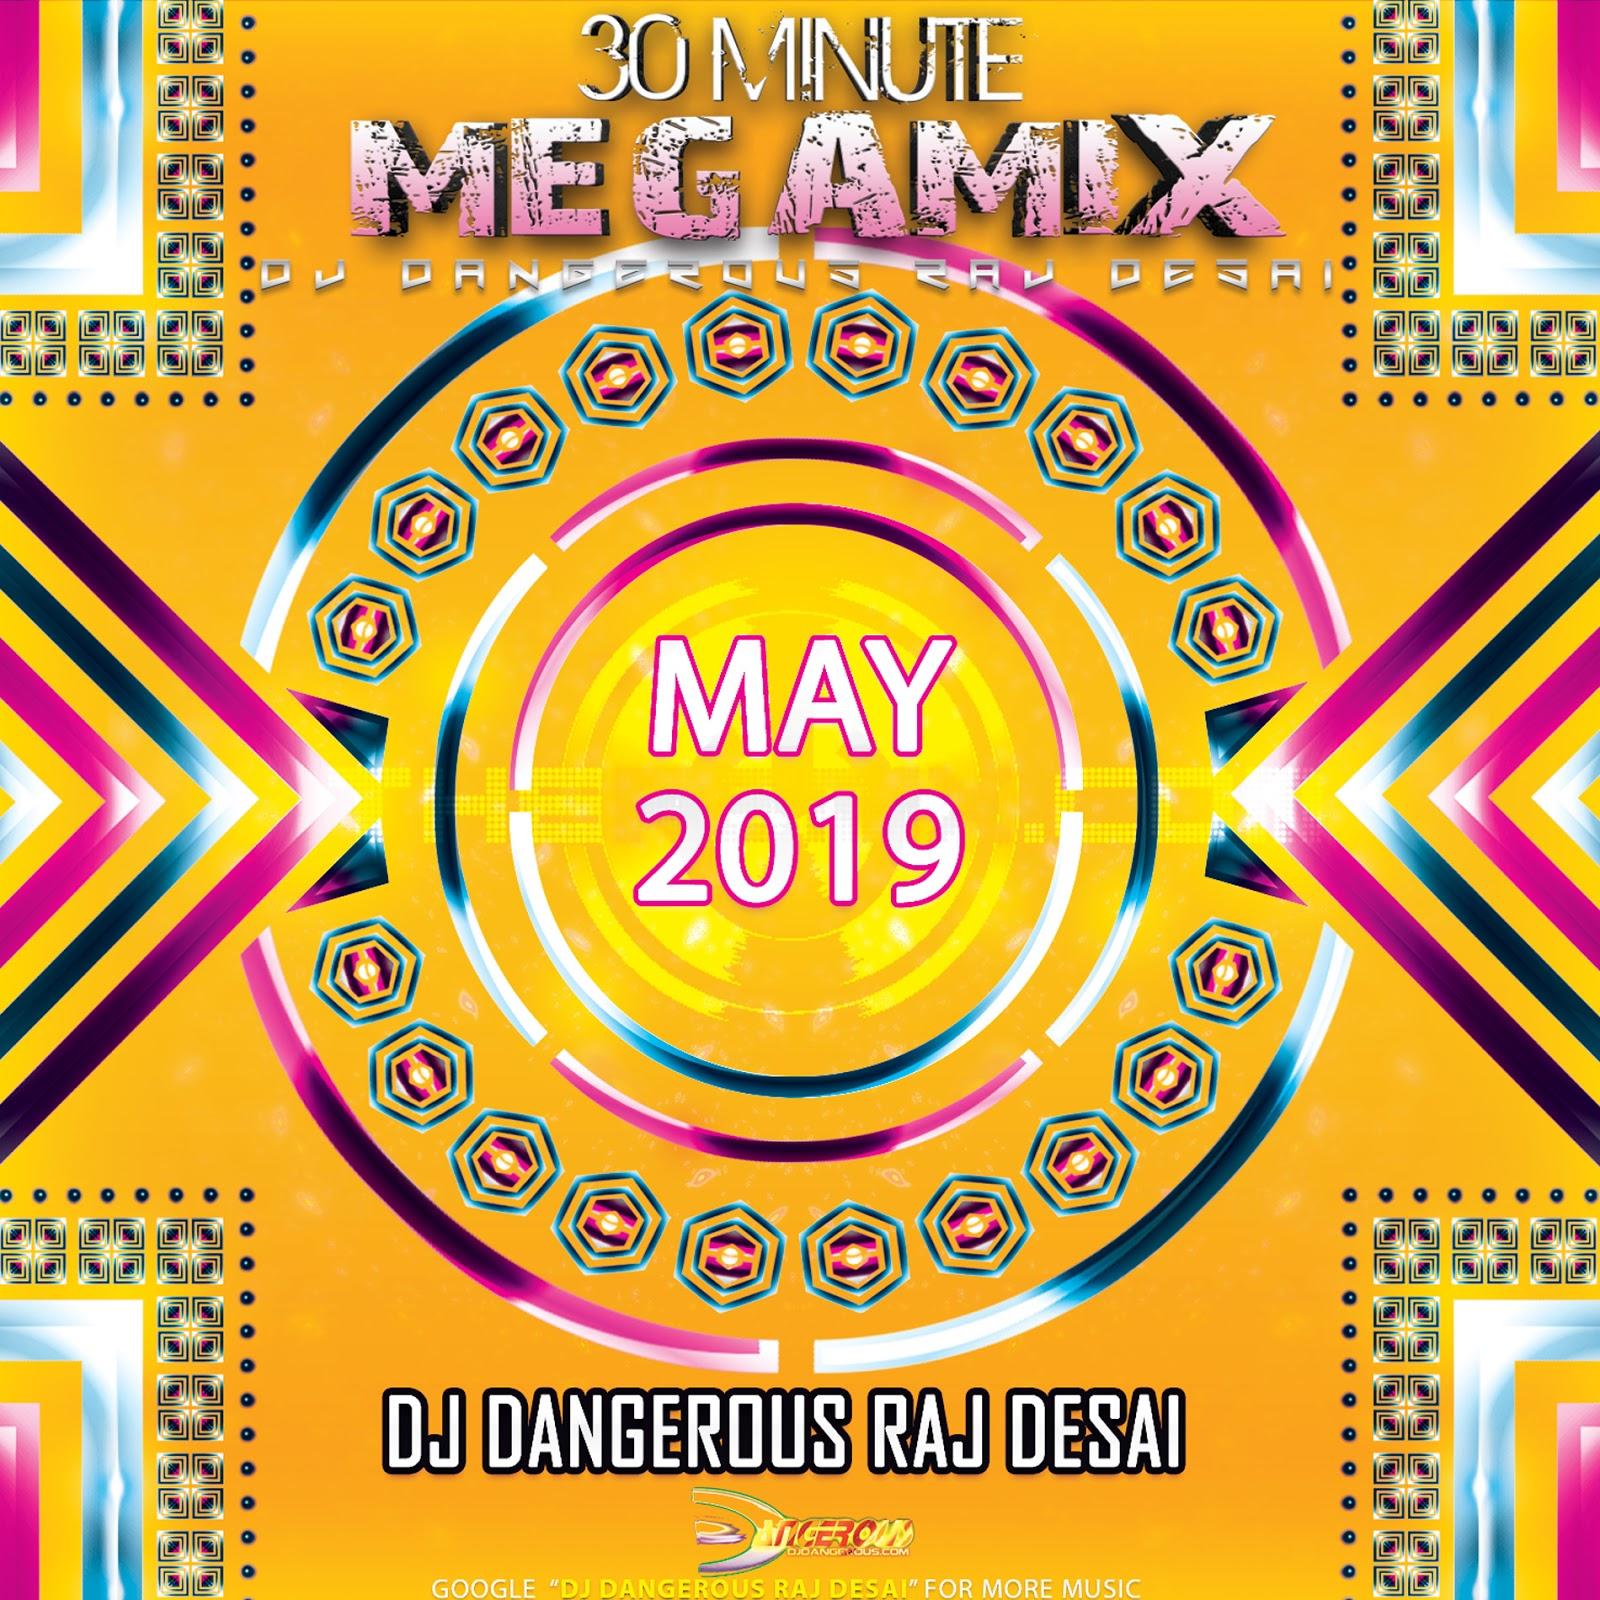 New Music 2019, New songs 2019, festival 2019 may, BEST EDM